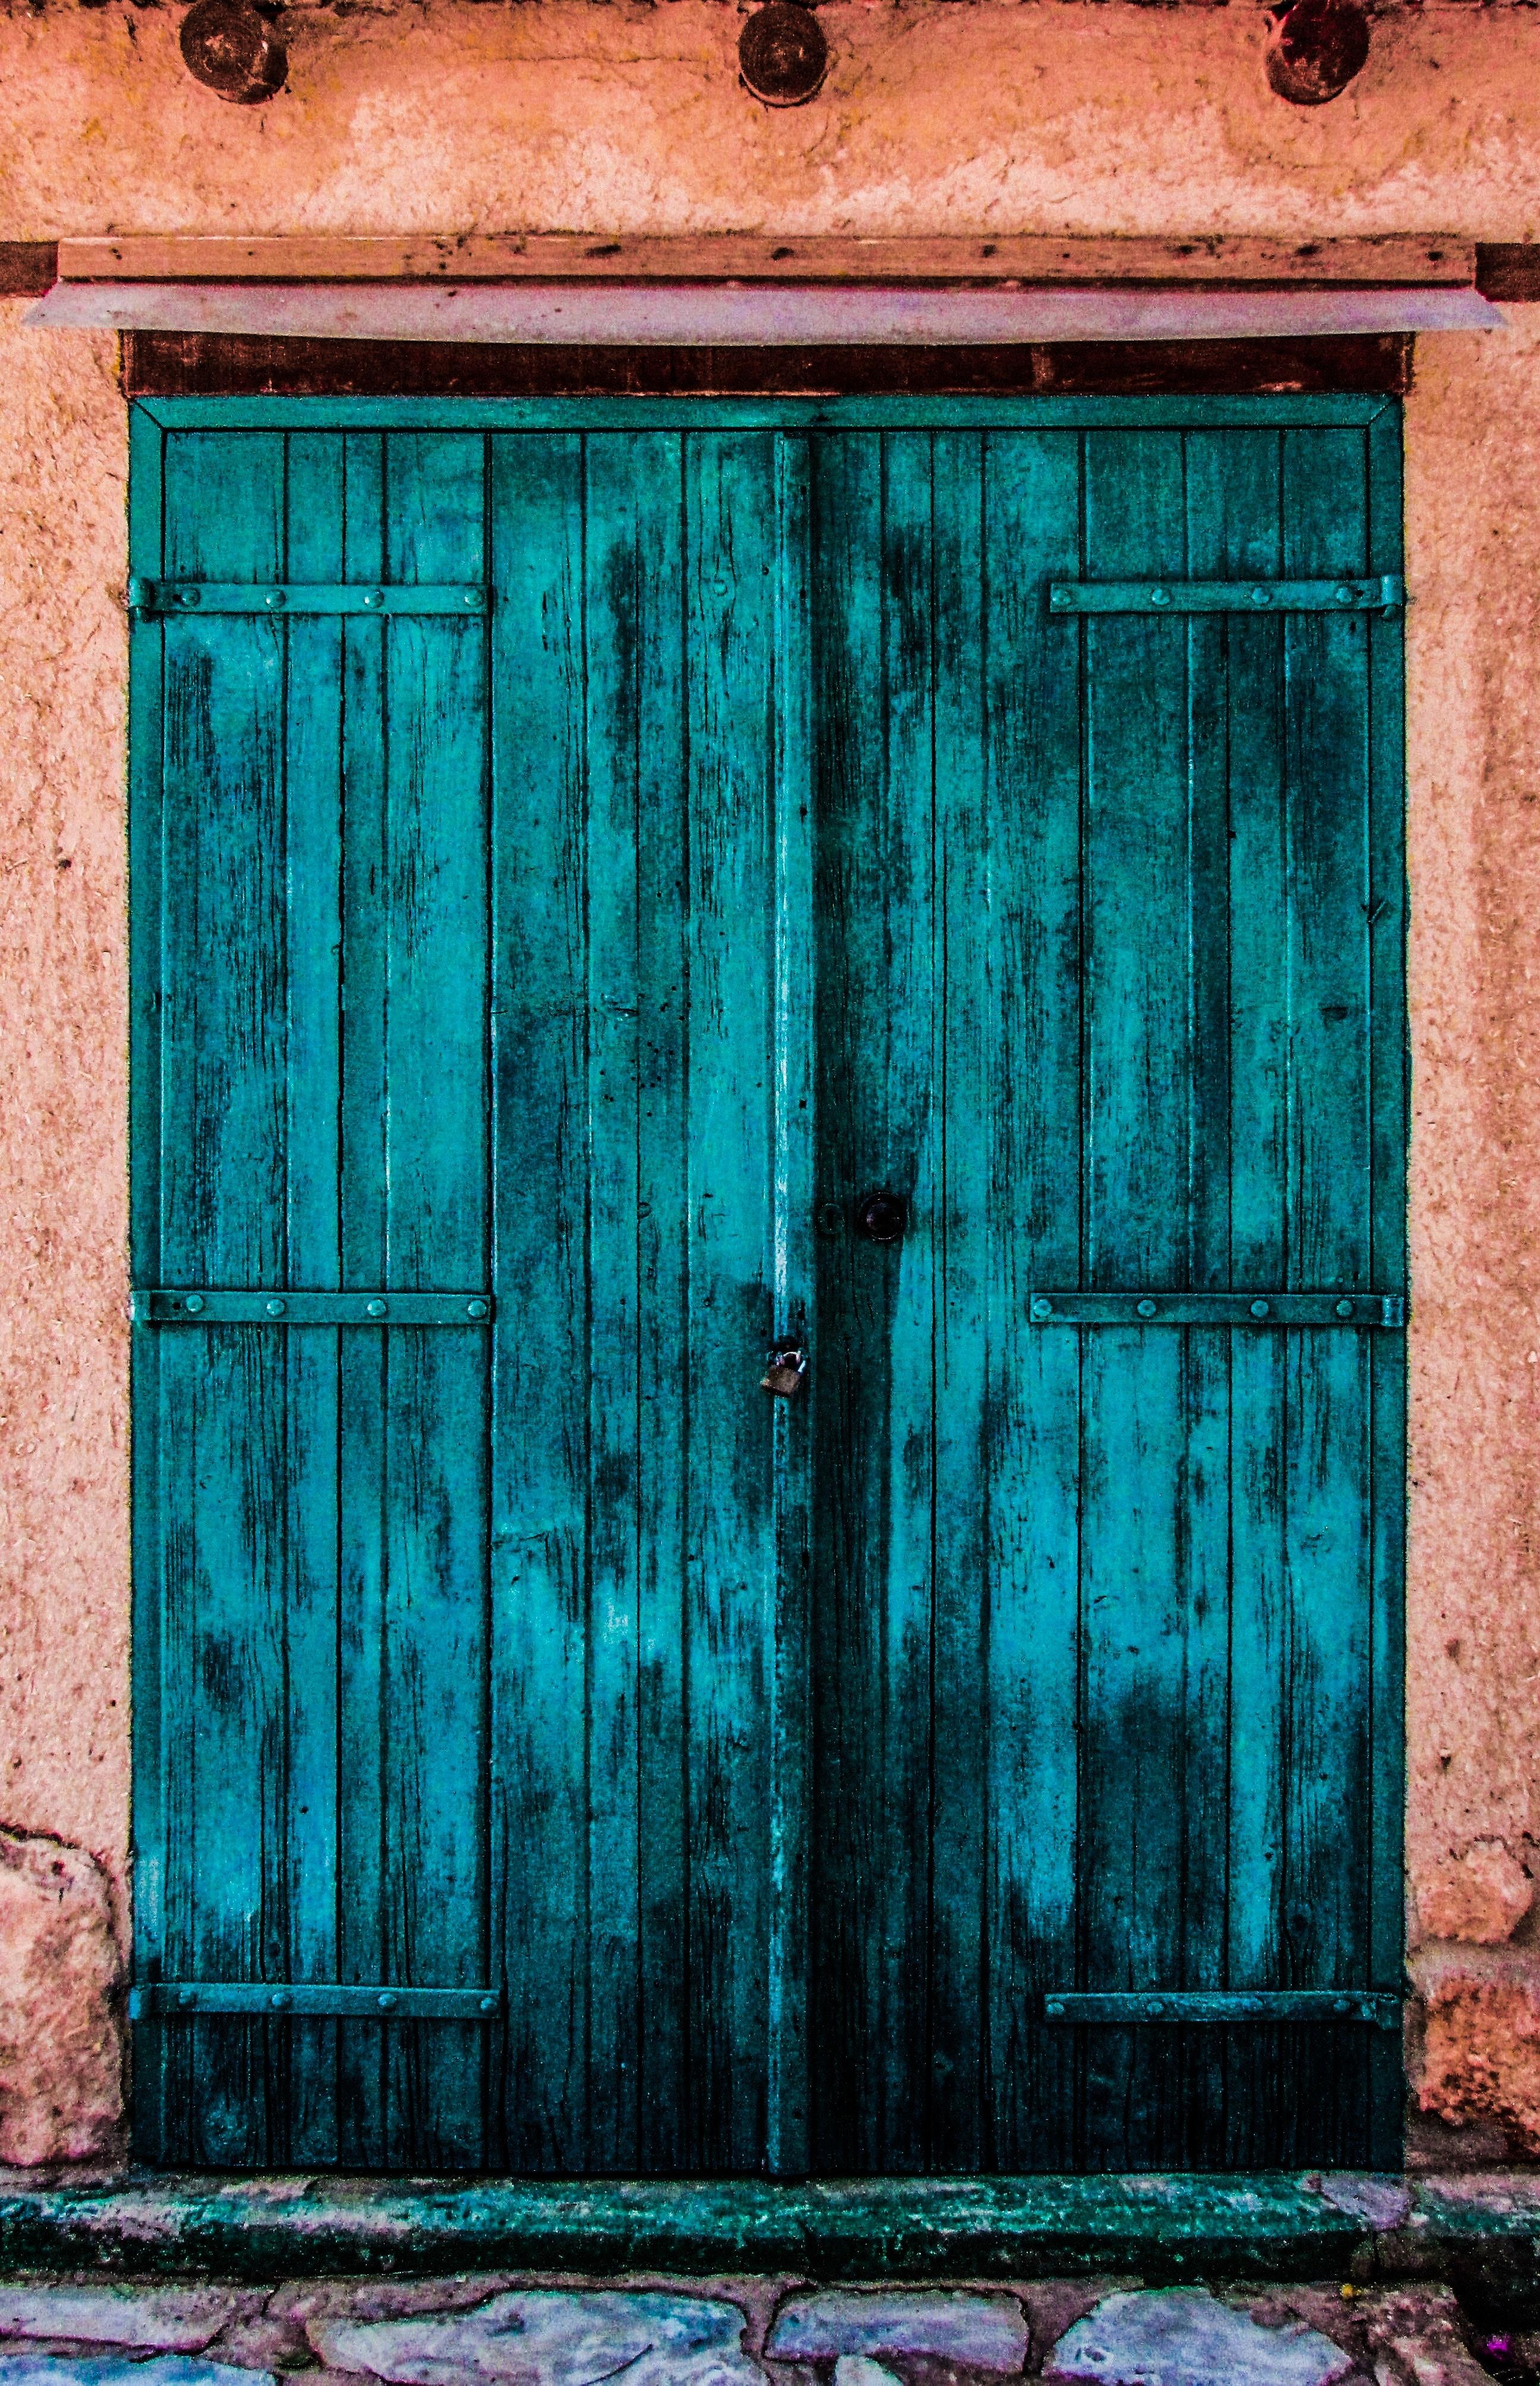 brown wooden window frame during daytime  u00b7 free stock photo